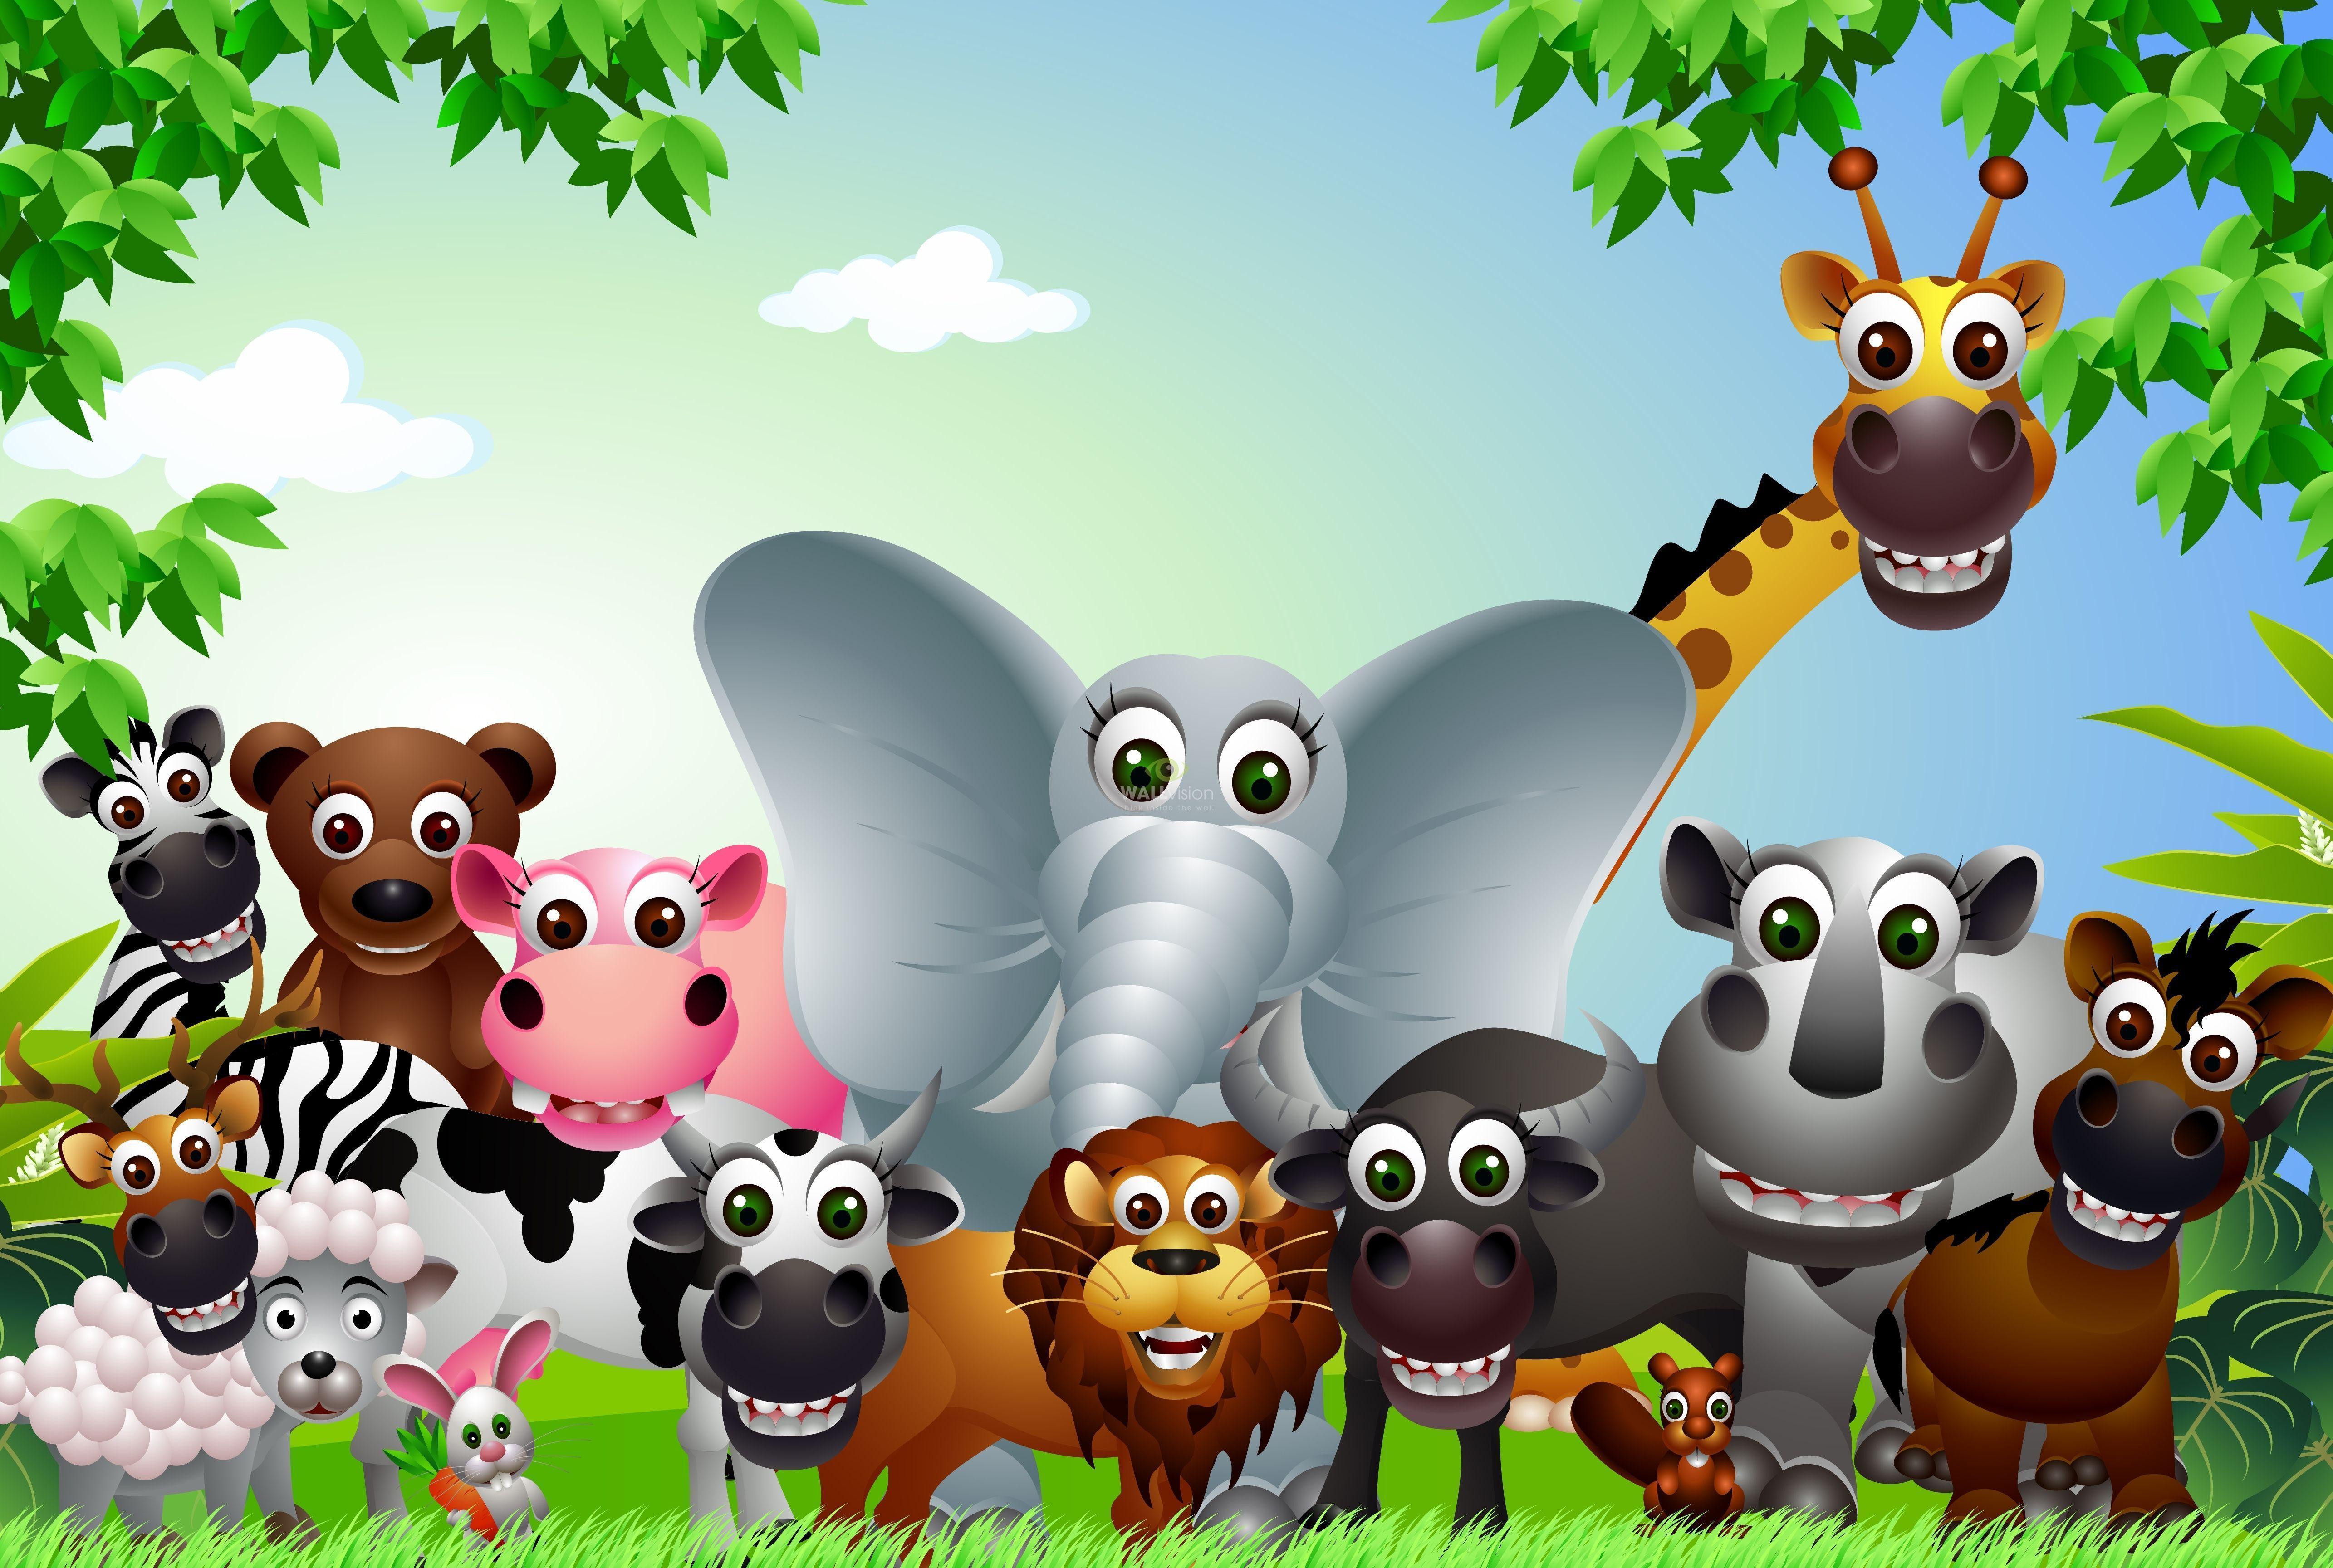 Cartoon Animals Wallpapers   Top Cartoon Animals Backgrounds 5142x3457